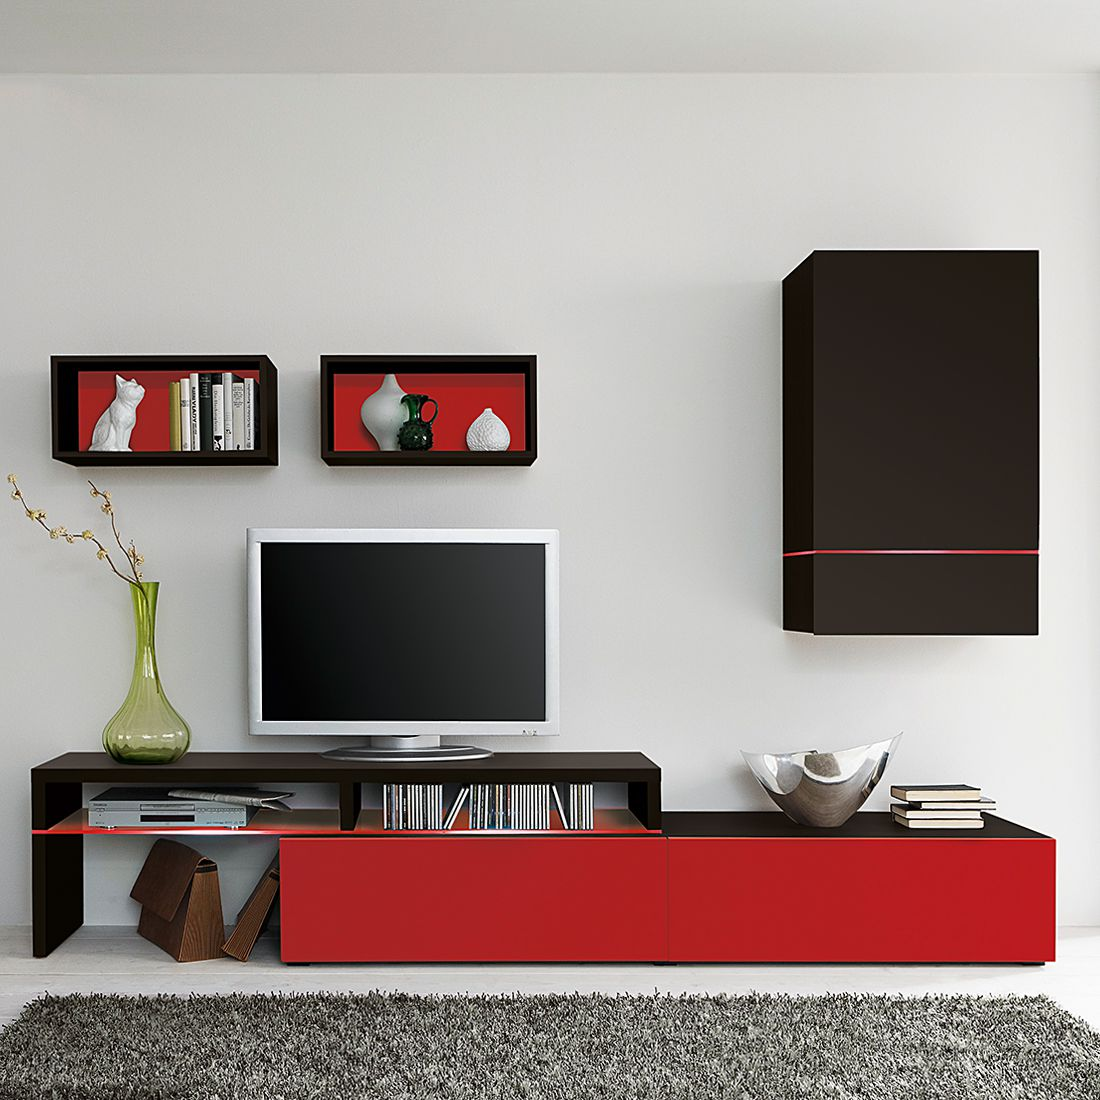 Eek A Wohnwand Colourart 4 Teilig Schwarz Rot Mit Led